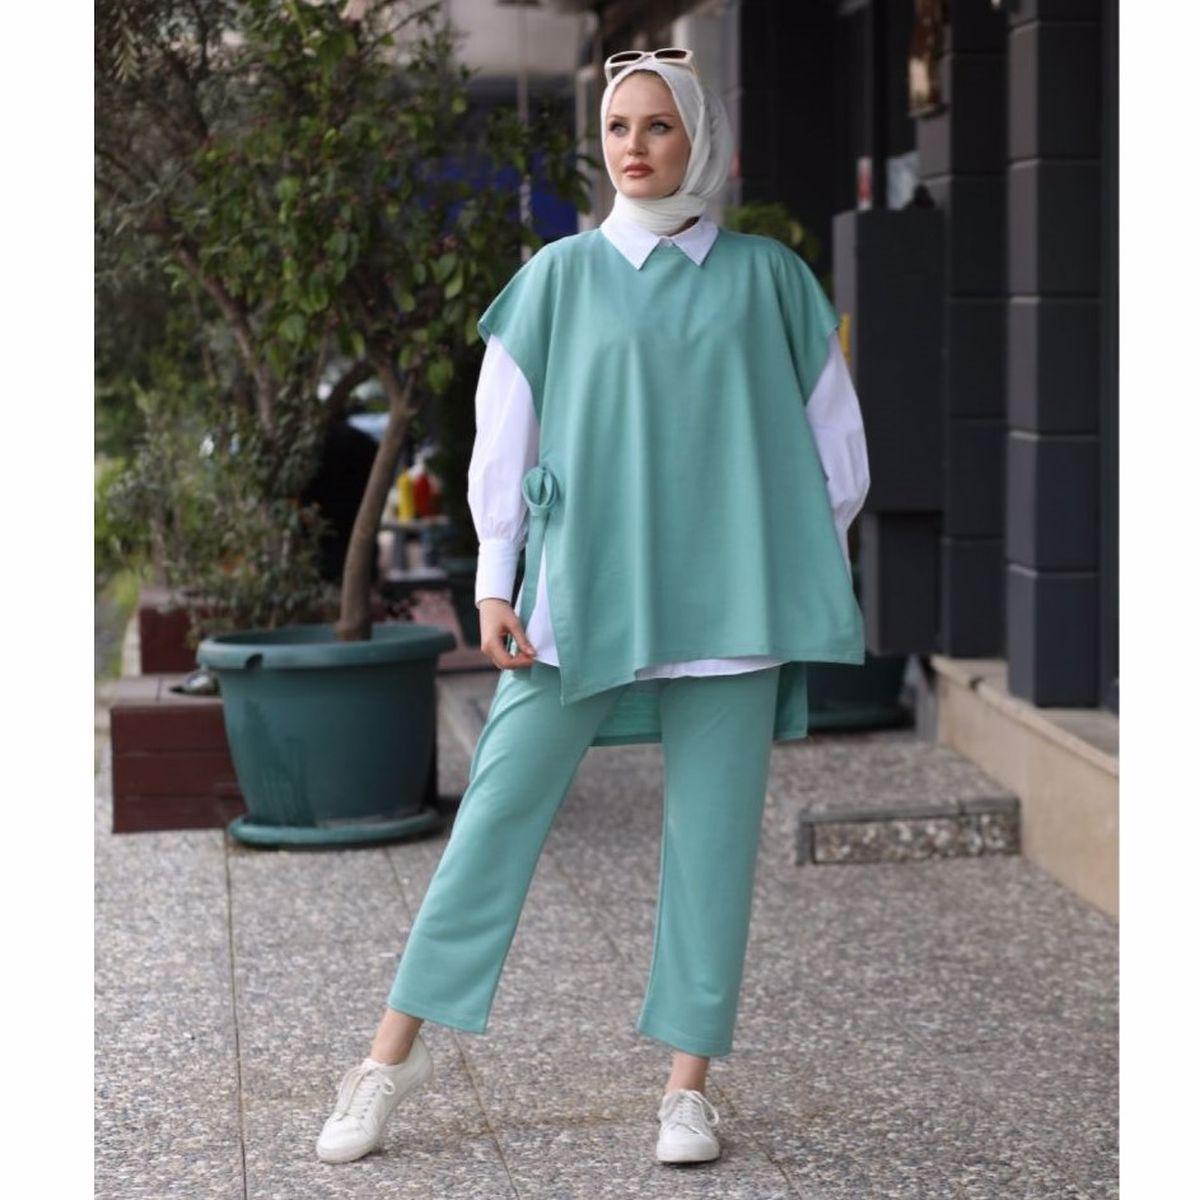 2 Piece Sweater and Sweatpants Women's Muslim Sport Set Muslim Fashion Islamic Clothing Turkey Dubai Abaya Hijab 2021